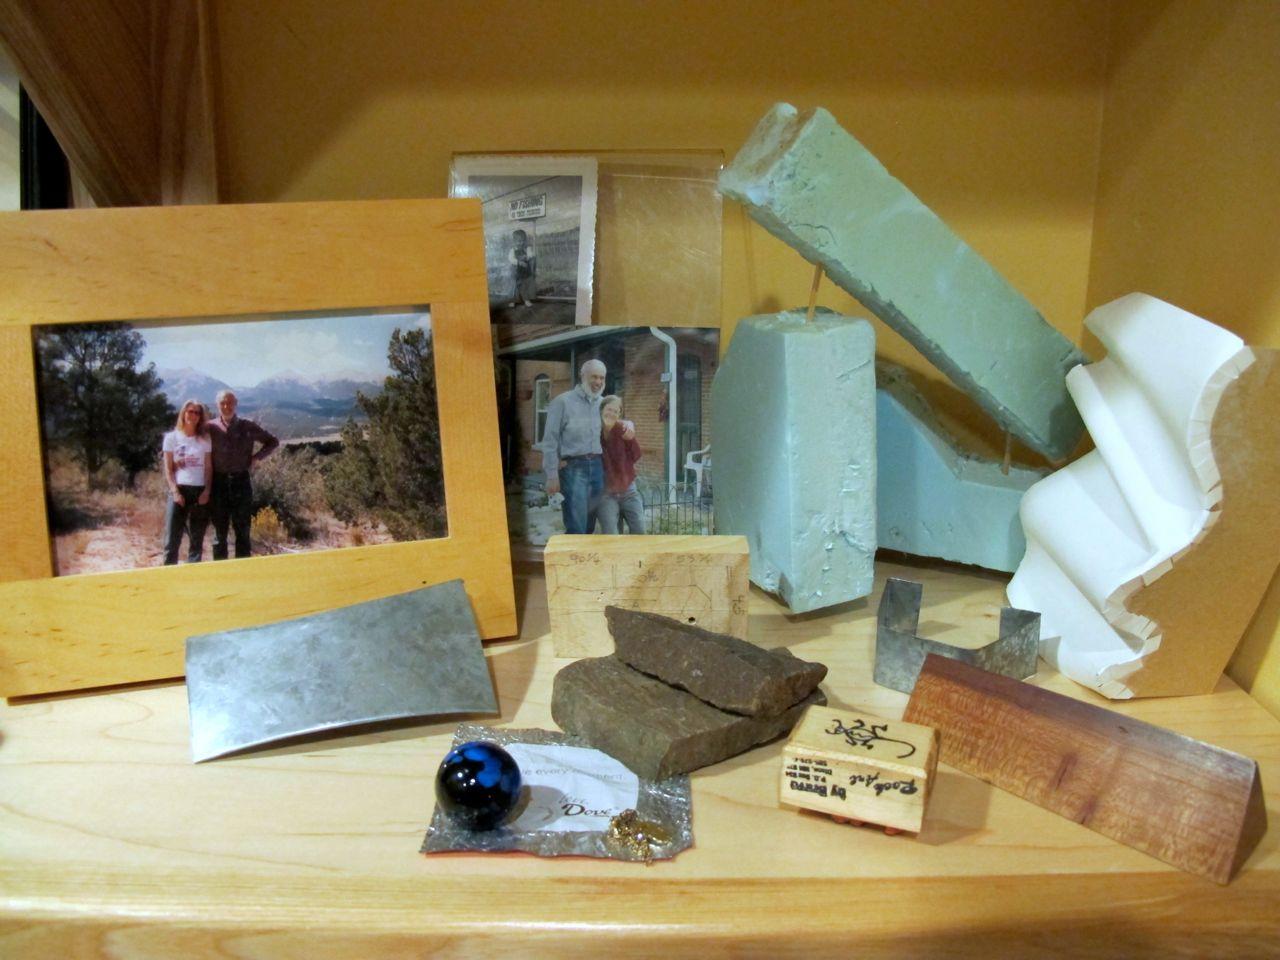 Richard memories and sculpture models on my bookshelf